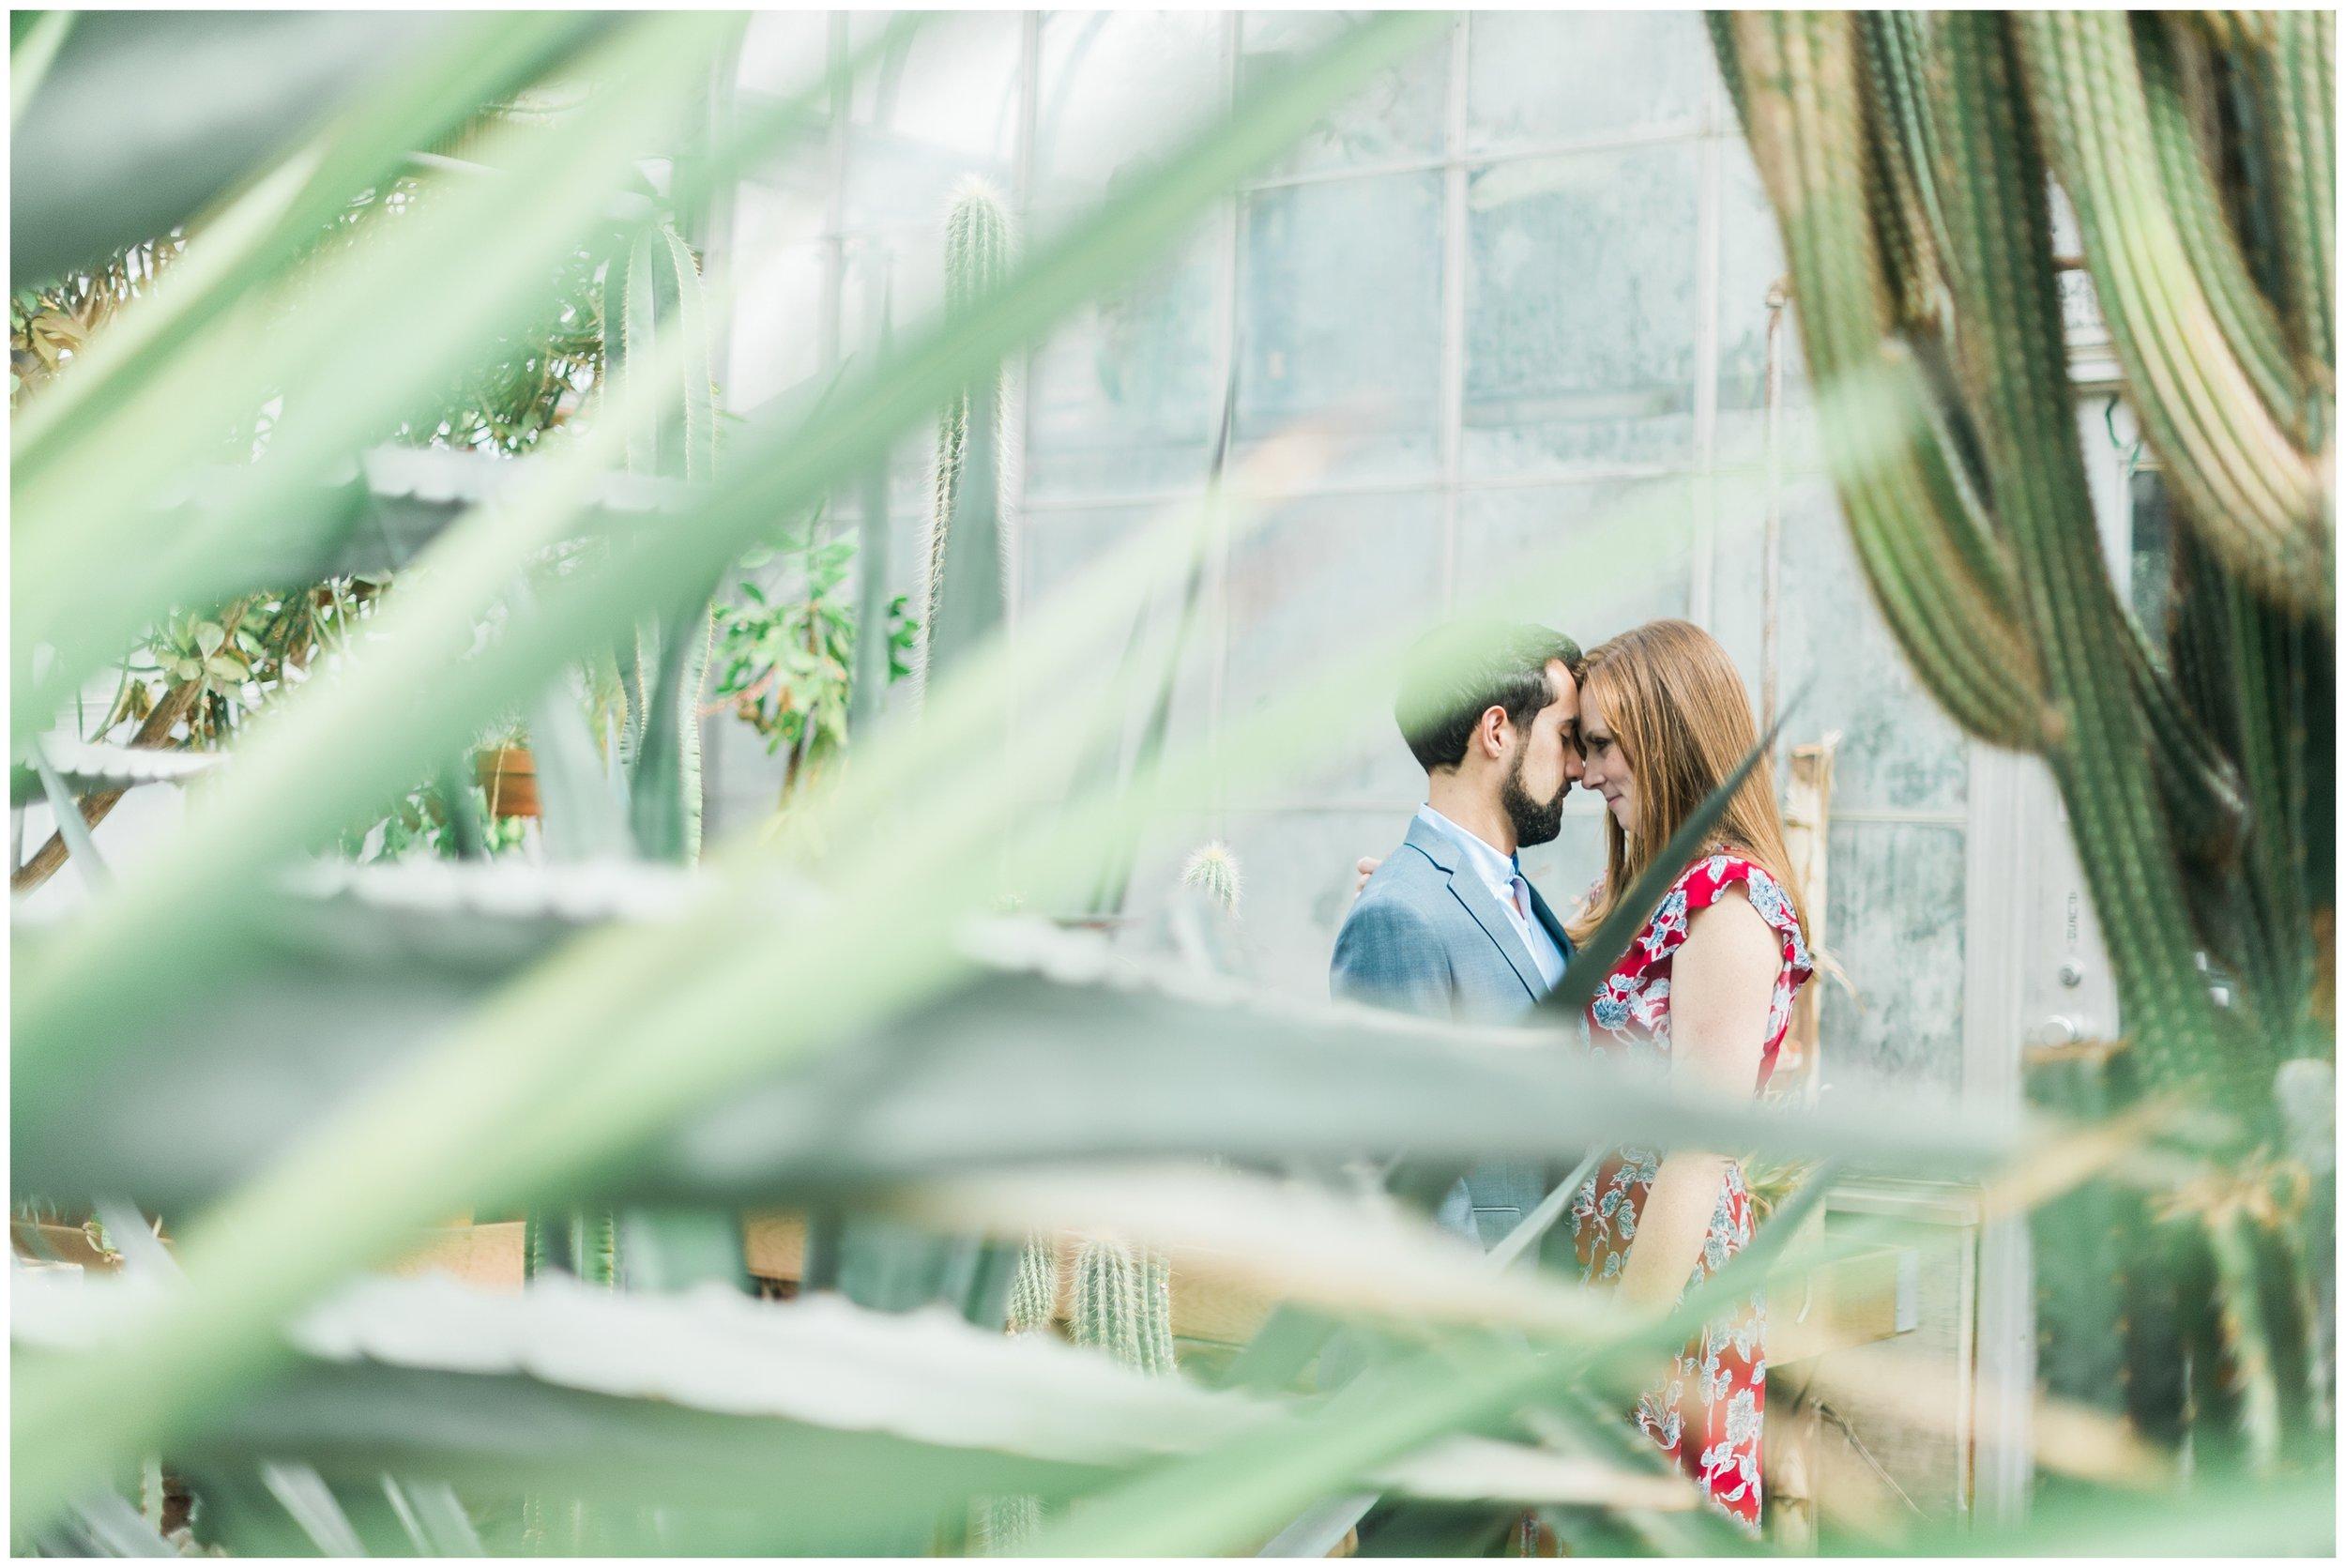 Rebecca_Bridges_Photography_Indianapolis_Wedding_Photographer_5995.jpg